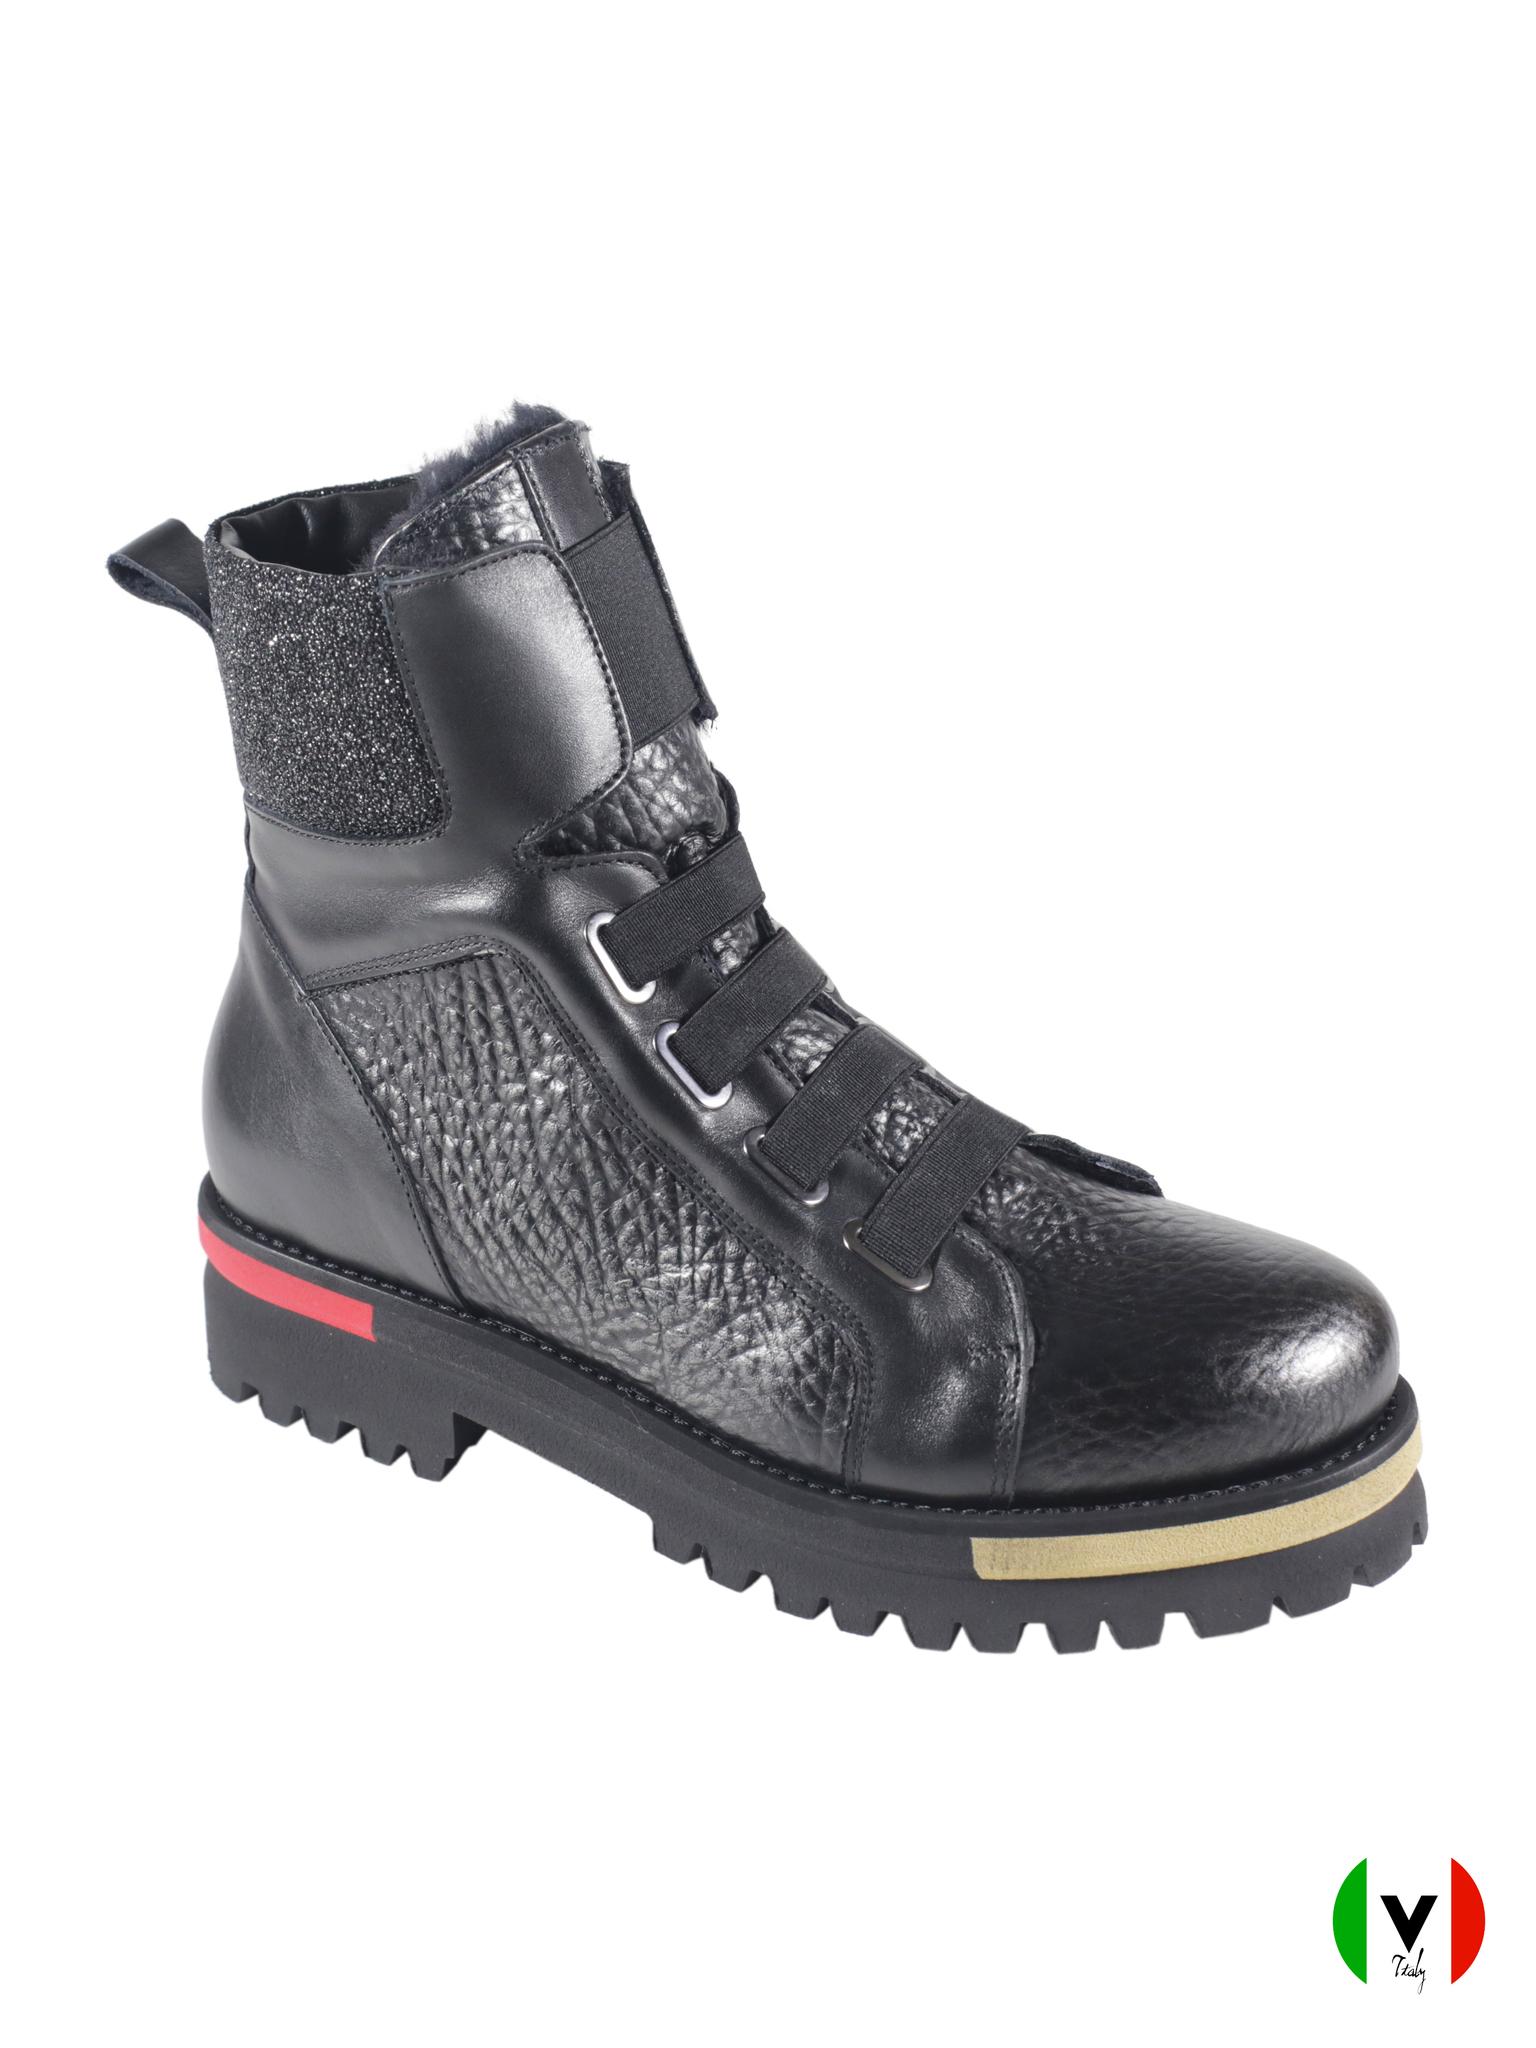 Зимние ботинки Laura Bellariva в спортивном стиле 4527, артикул 4527, сезон зима, цвет чёрный, материал кожа, цена 16 500 руб., veroitaly.ru